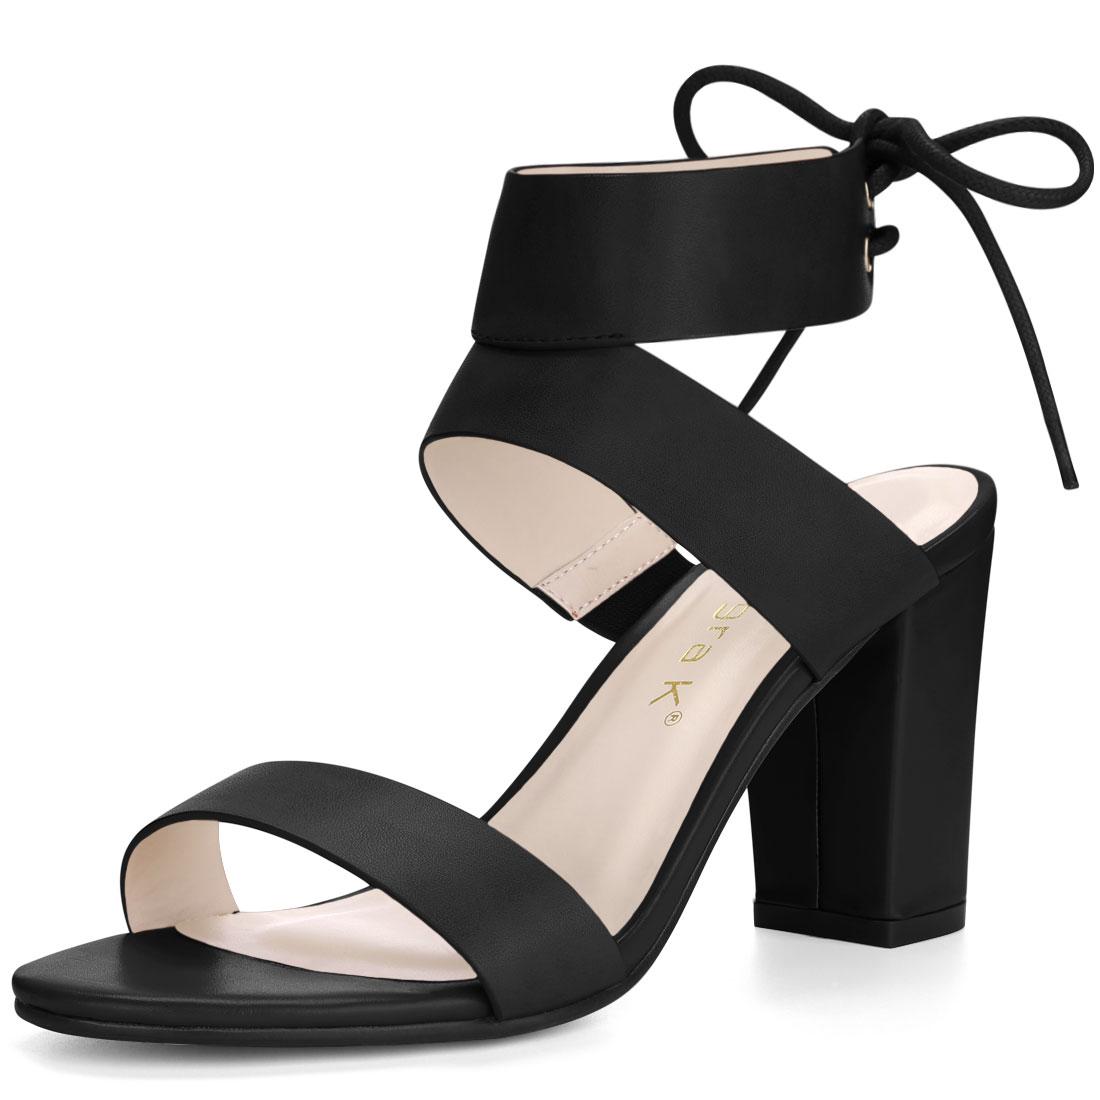 Women Open Toe Lace Up Back High Block Heel Sandals Black US 6.5